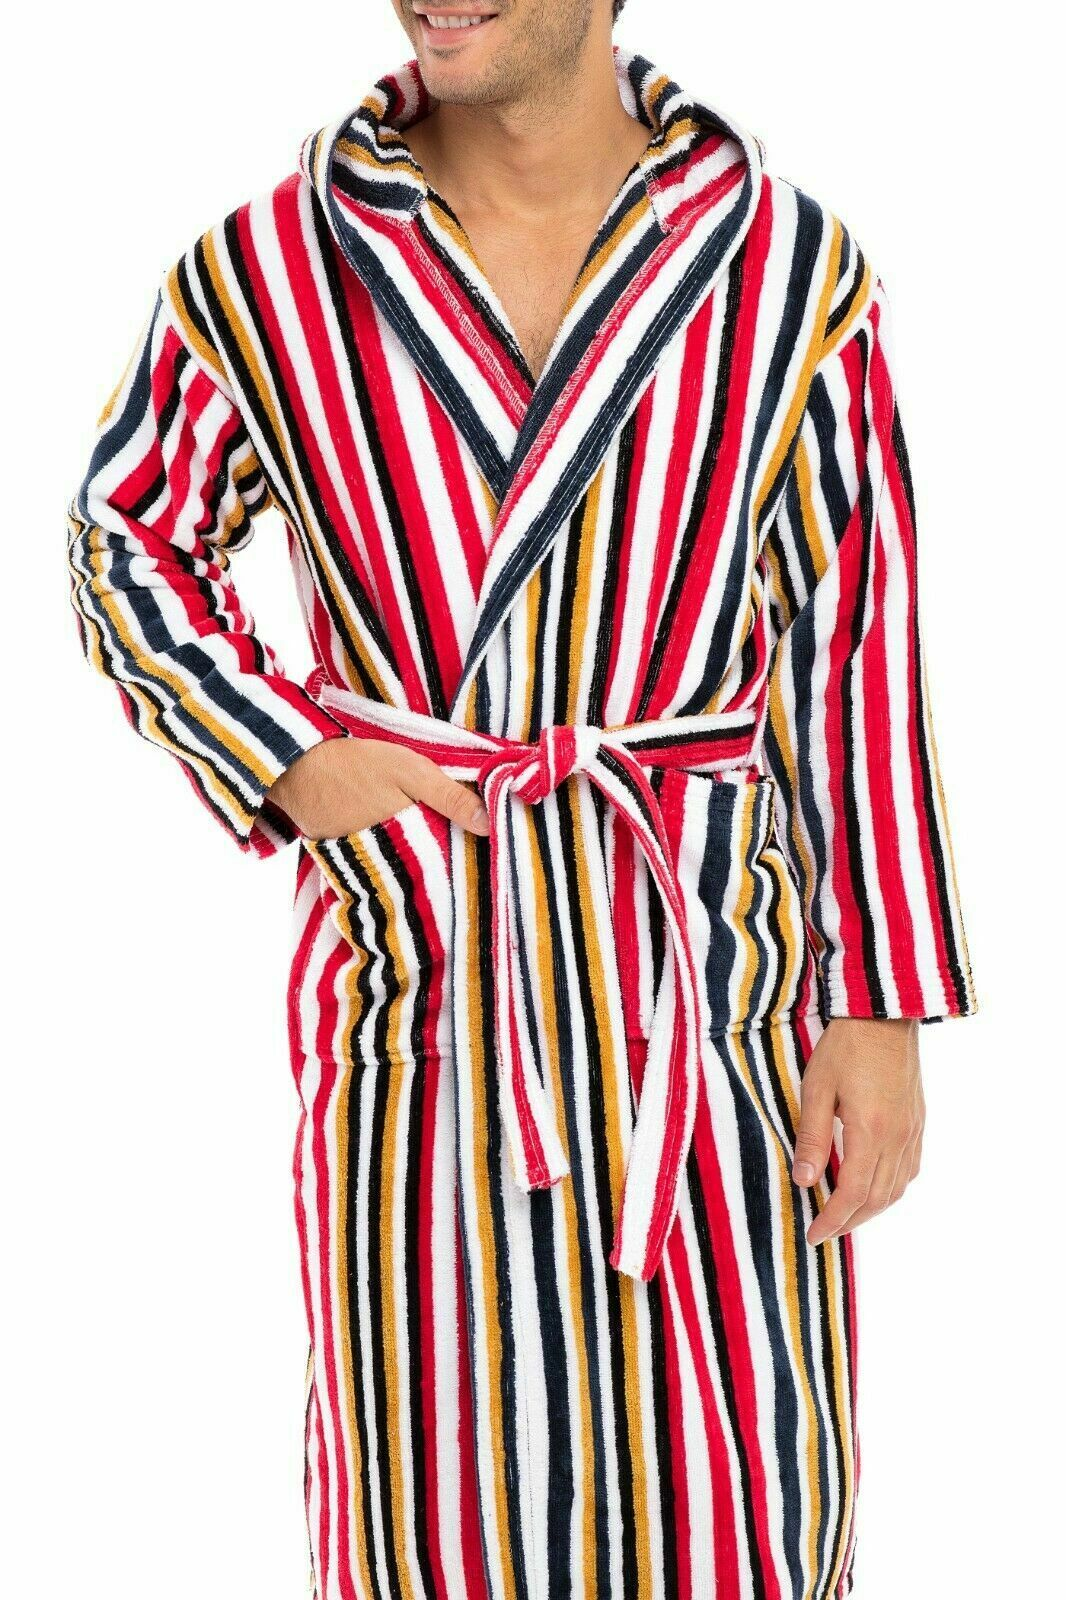 Men's Luxury Robes 100/% Terry Cotton Hooded Bathrobe Spa Robe Bath Robes